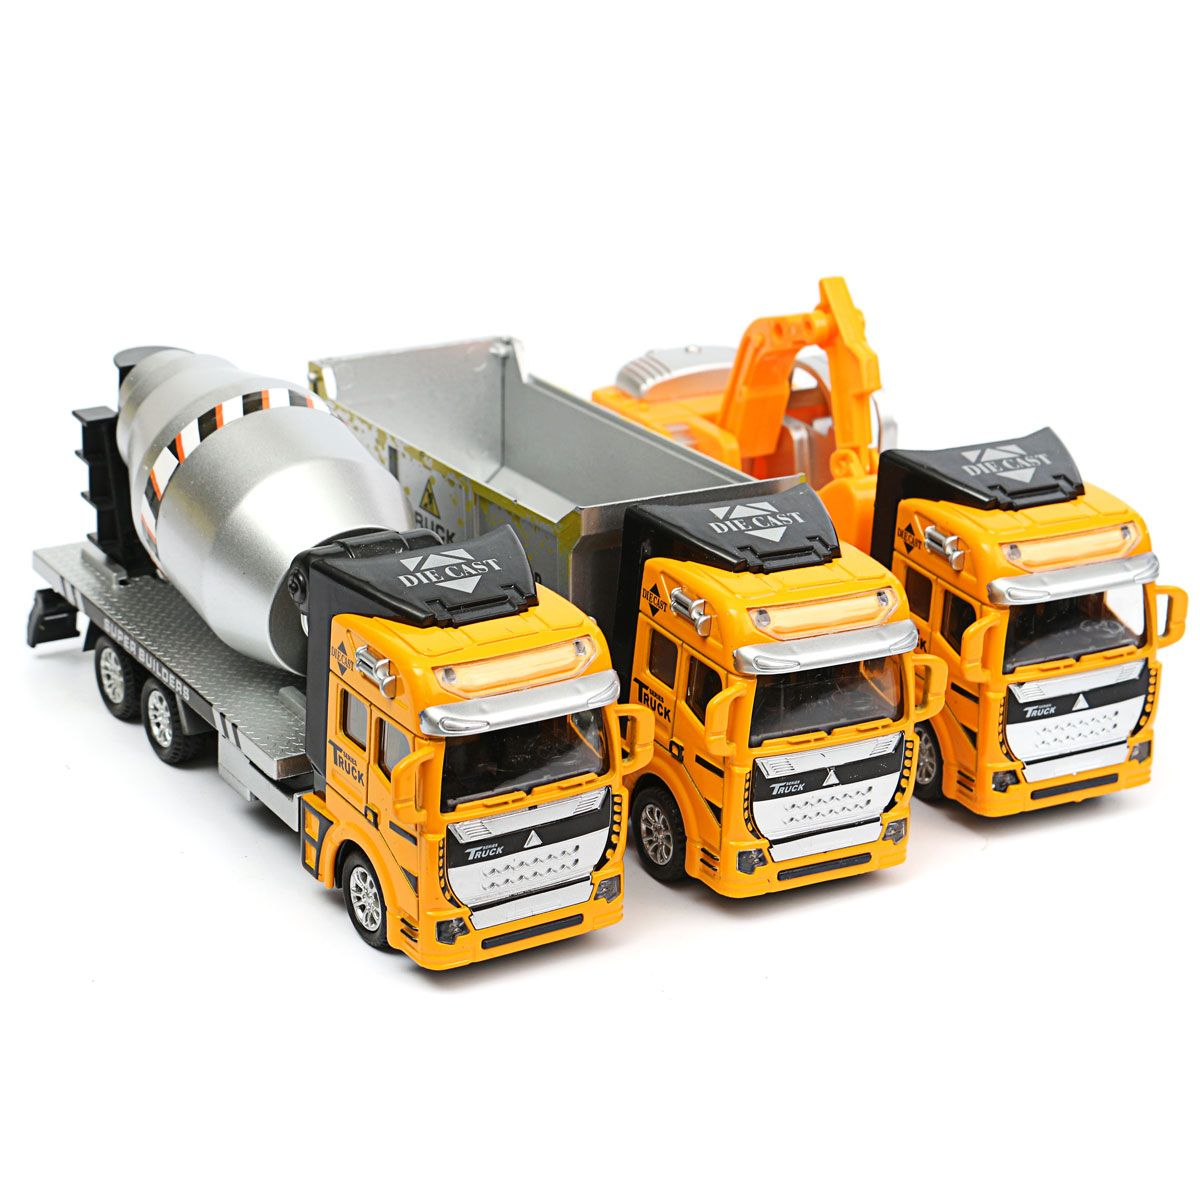 Children Model Pullback Digger Excavator Construction Vehicle Trucks Vans Toy